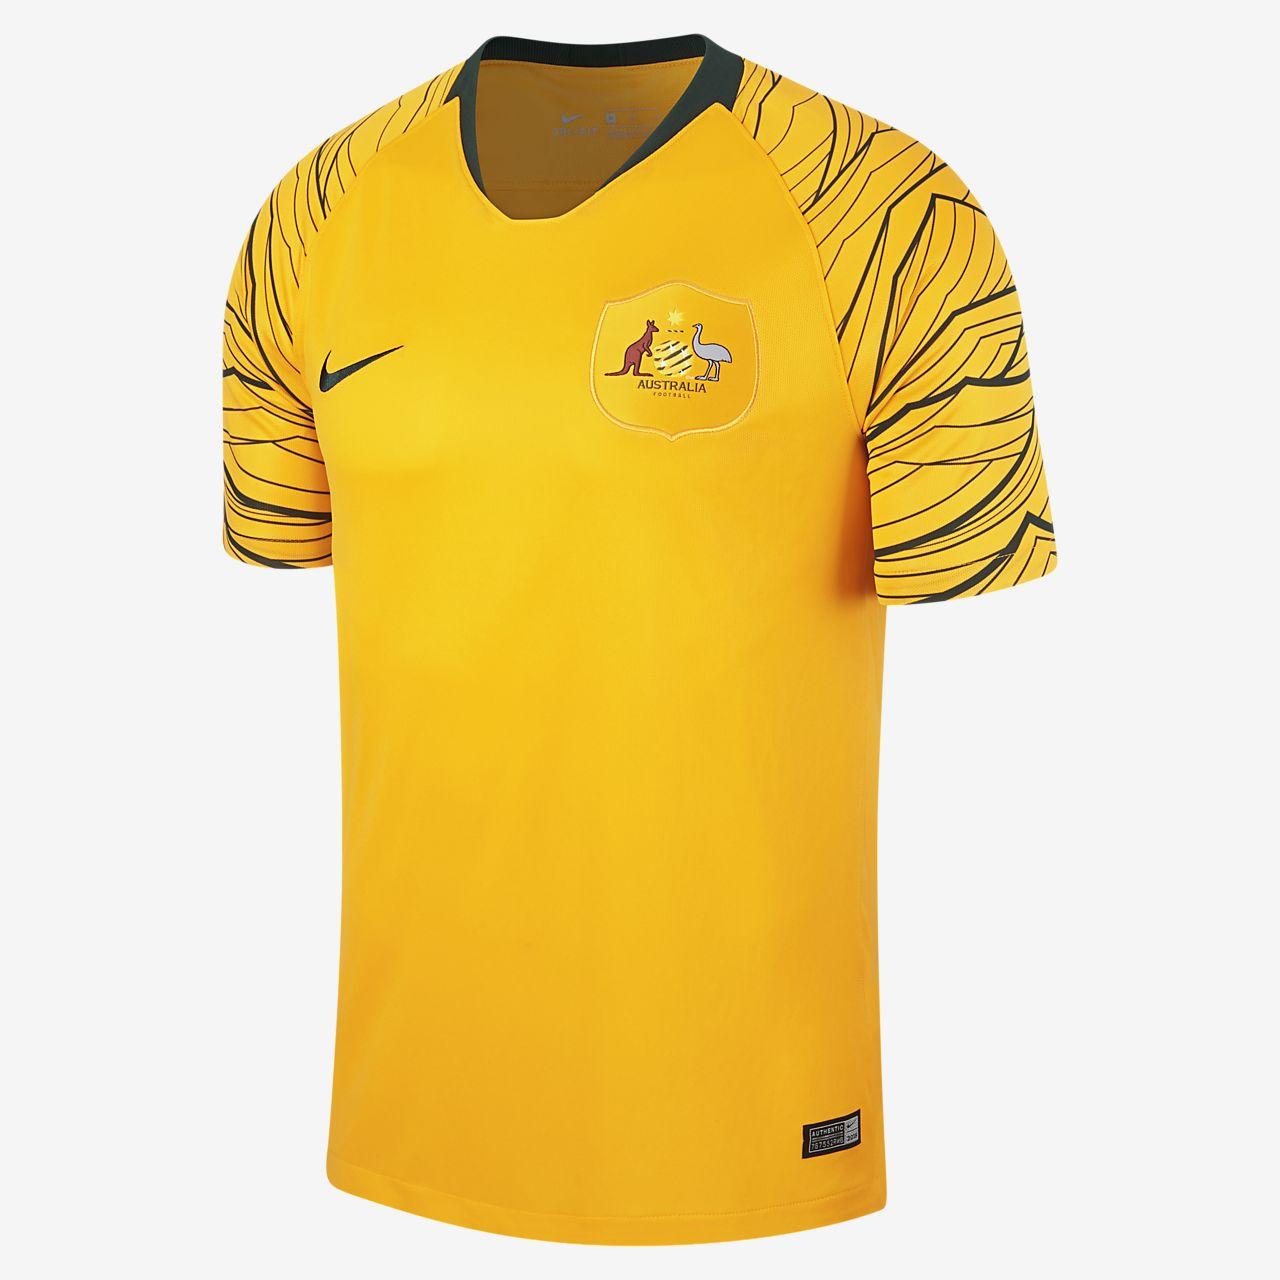 2018 Australia Stadium Home Men's Football Shirt